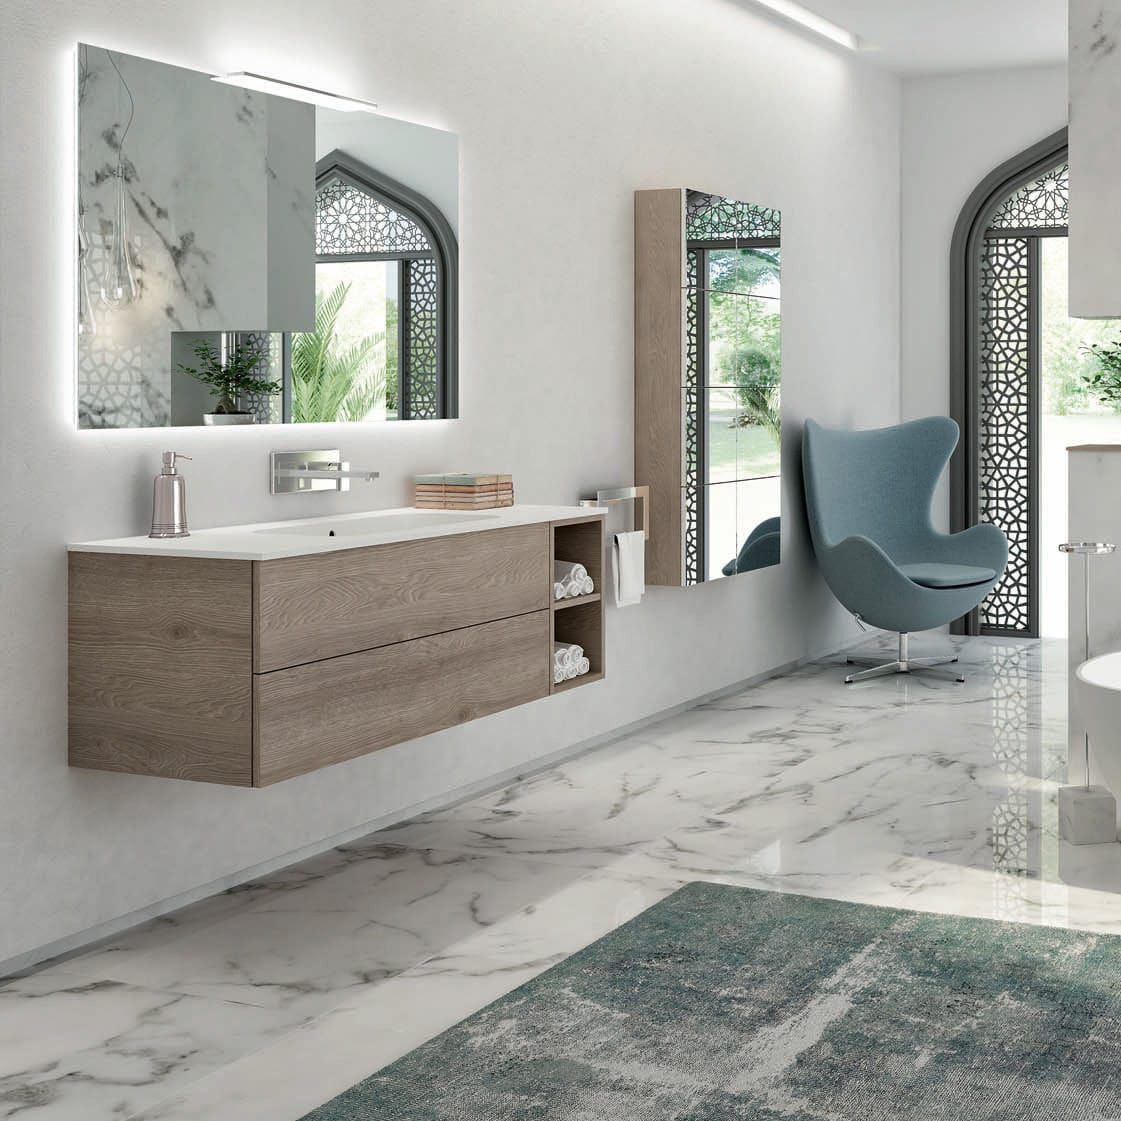 Doppel waschtischunterschrank design  Waschtischunterschrank Modern | gispatcher.com